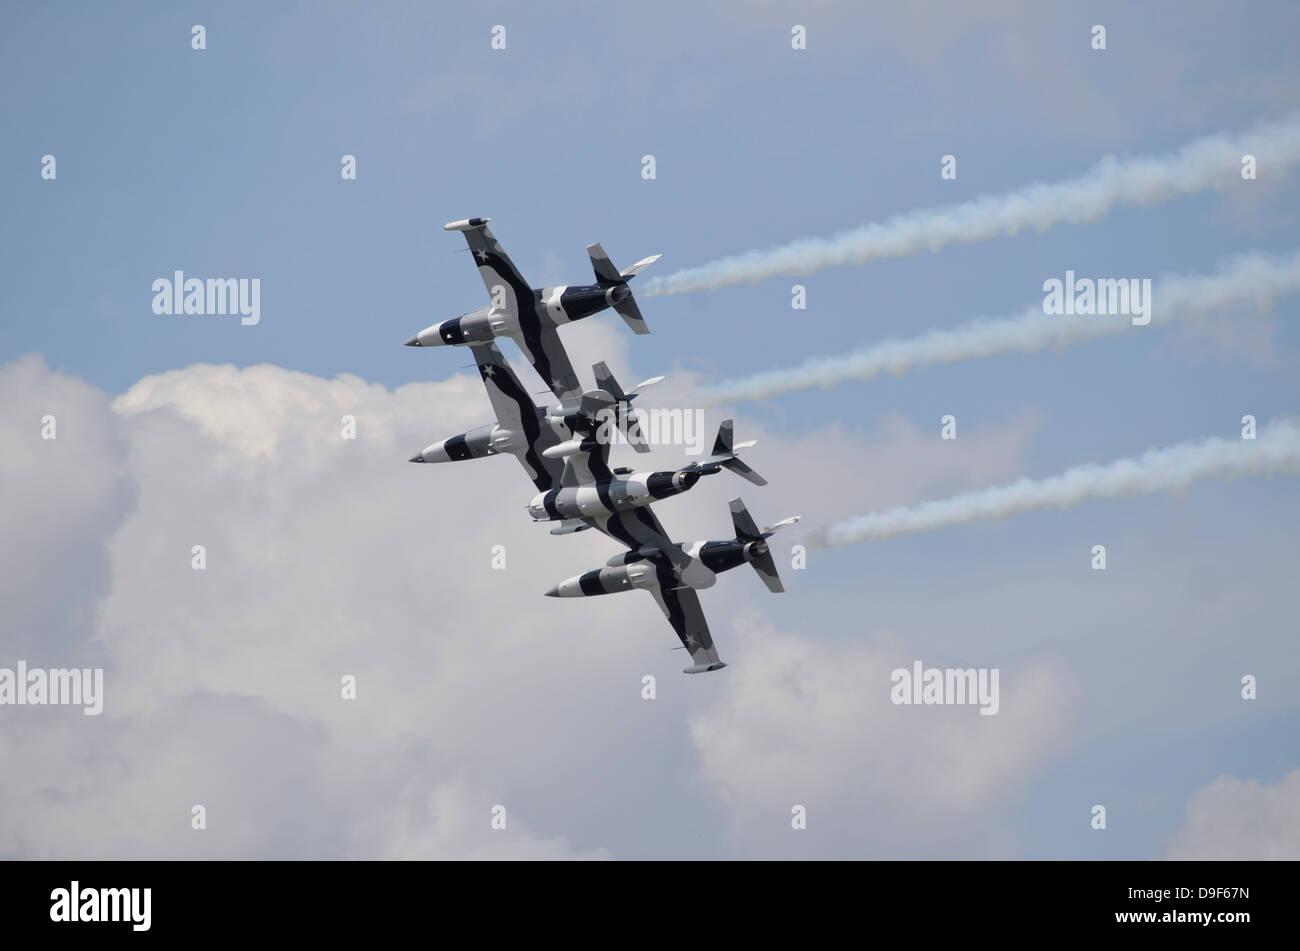 The Black Diamond Jet Team fly in diamond formation. - Stock Image